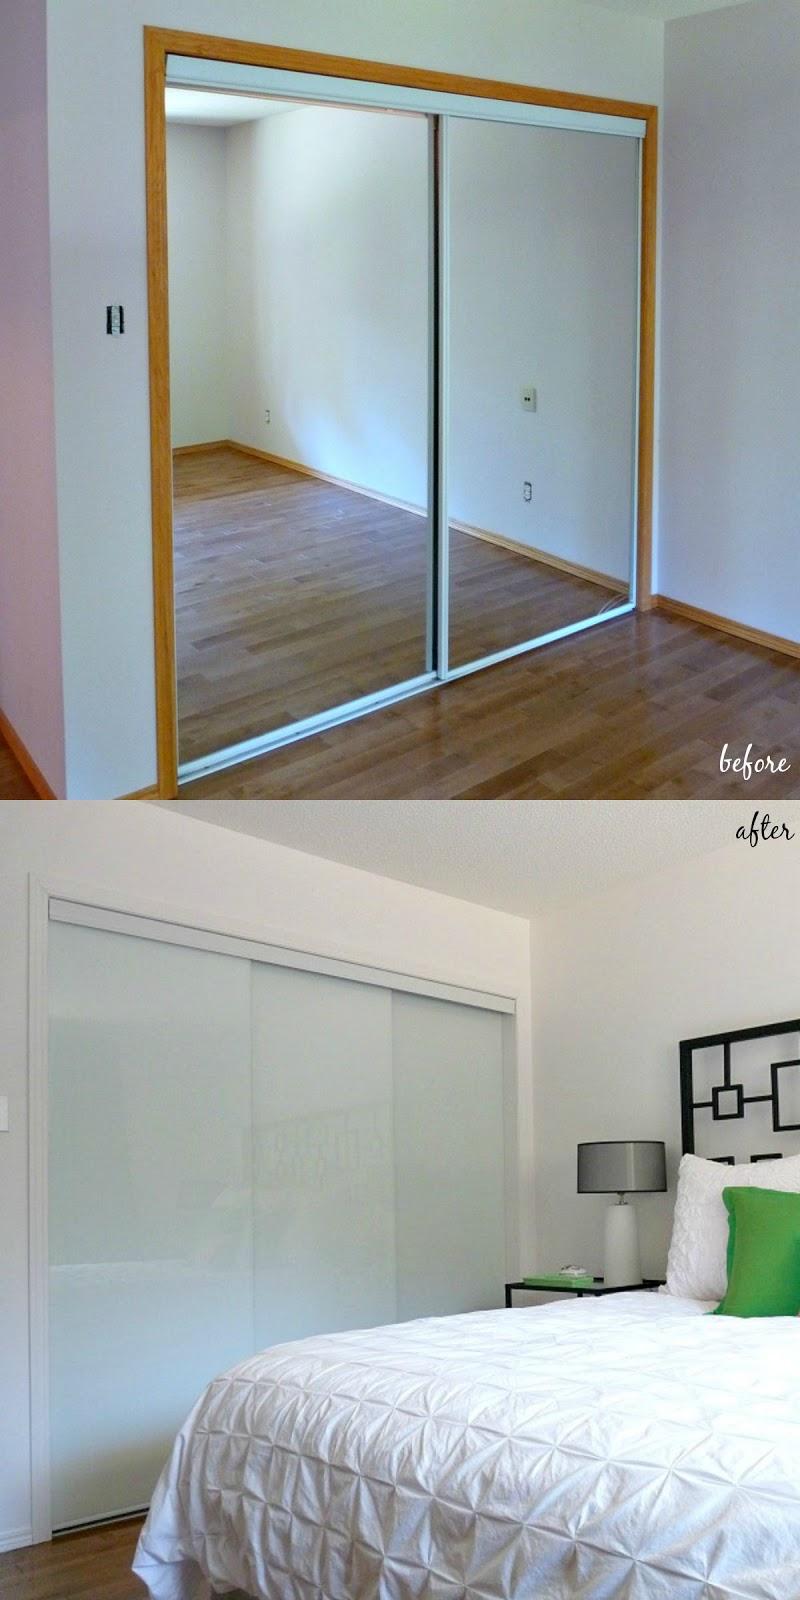 New White Glass Sliding Closet Doors In The Bedroom